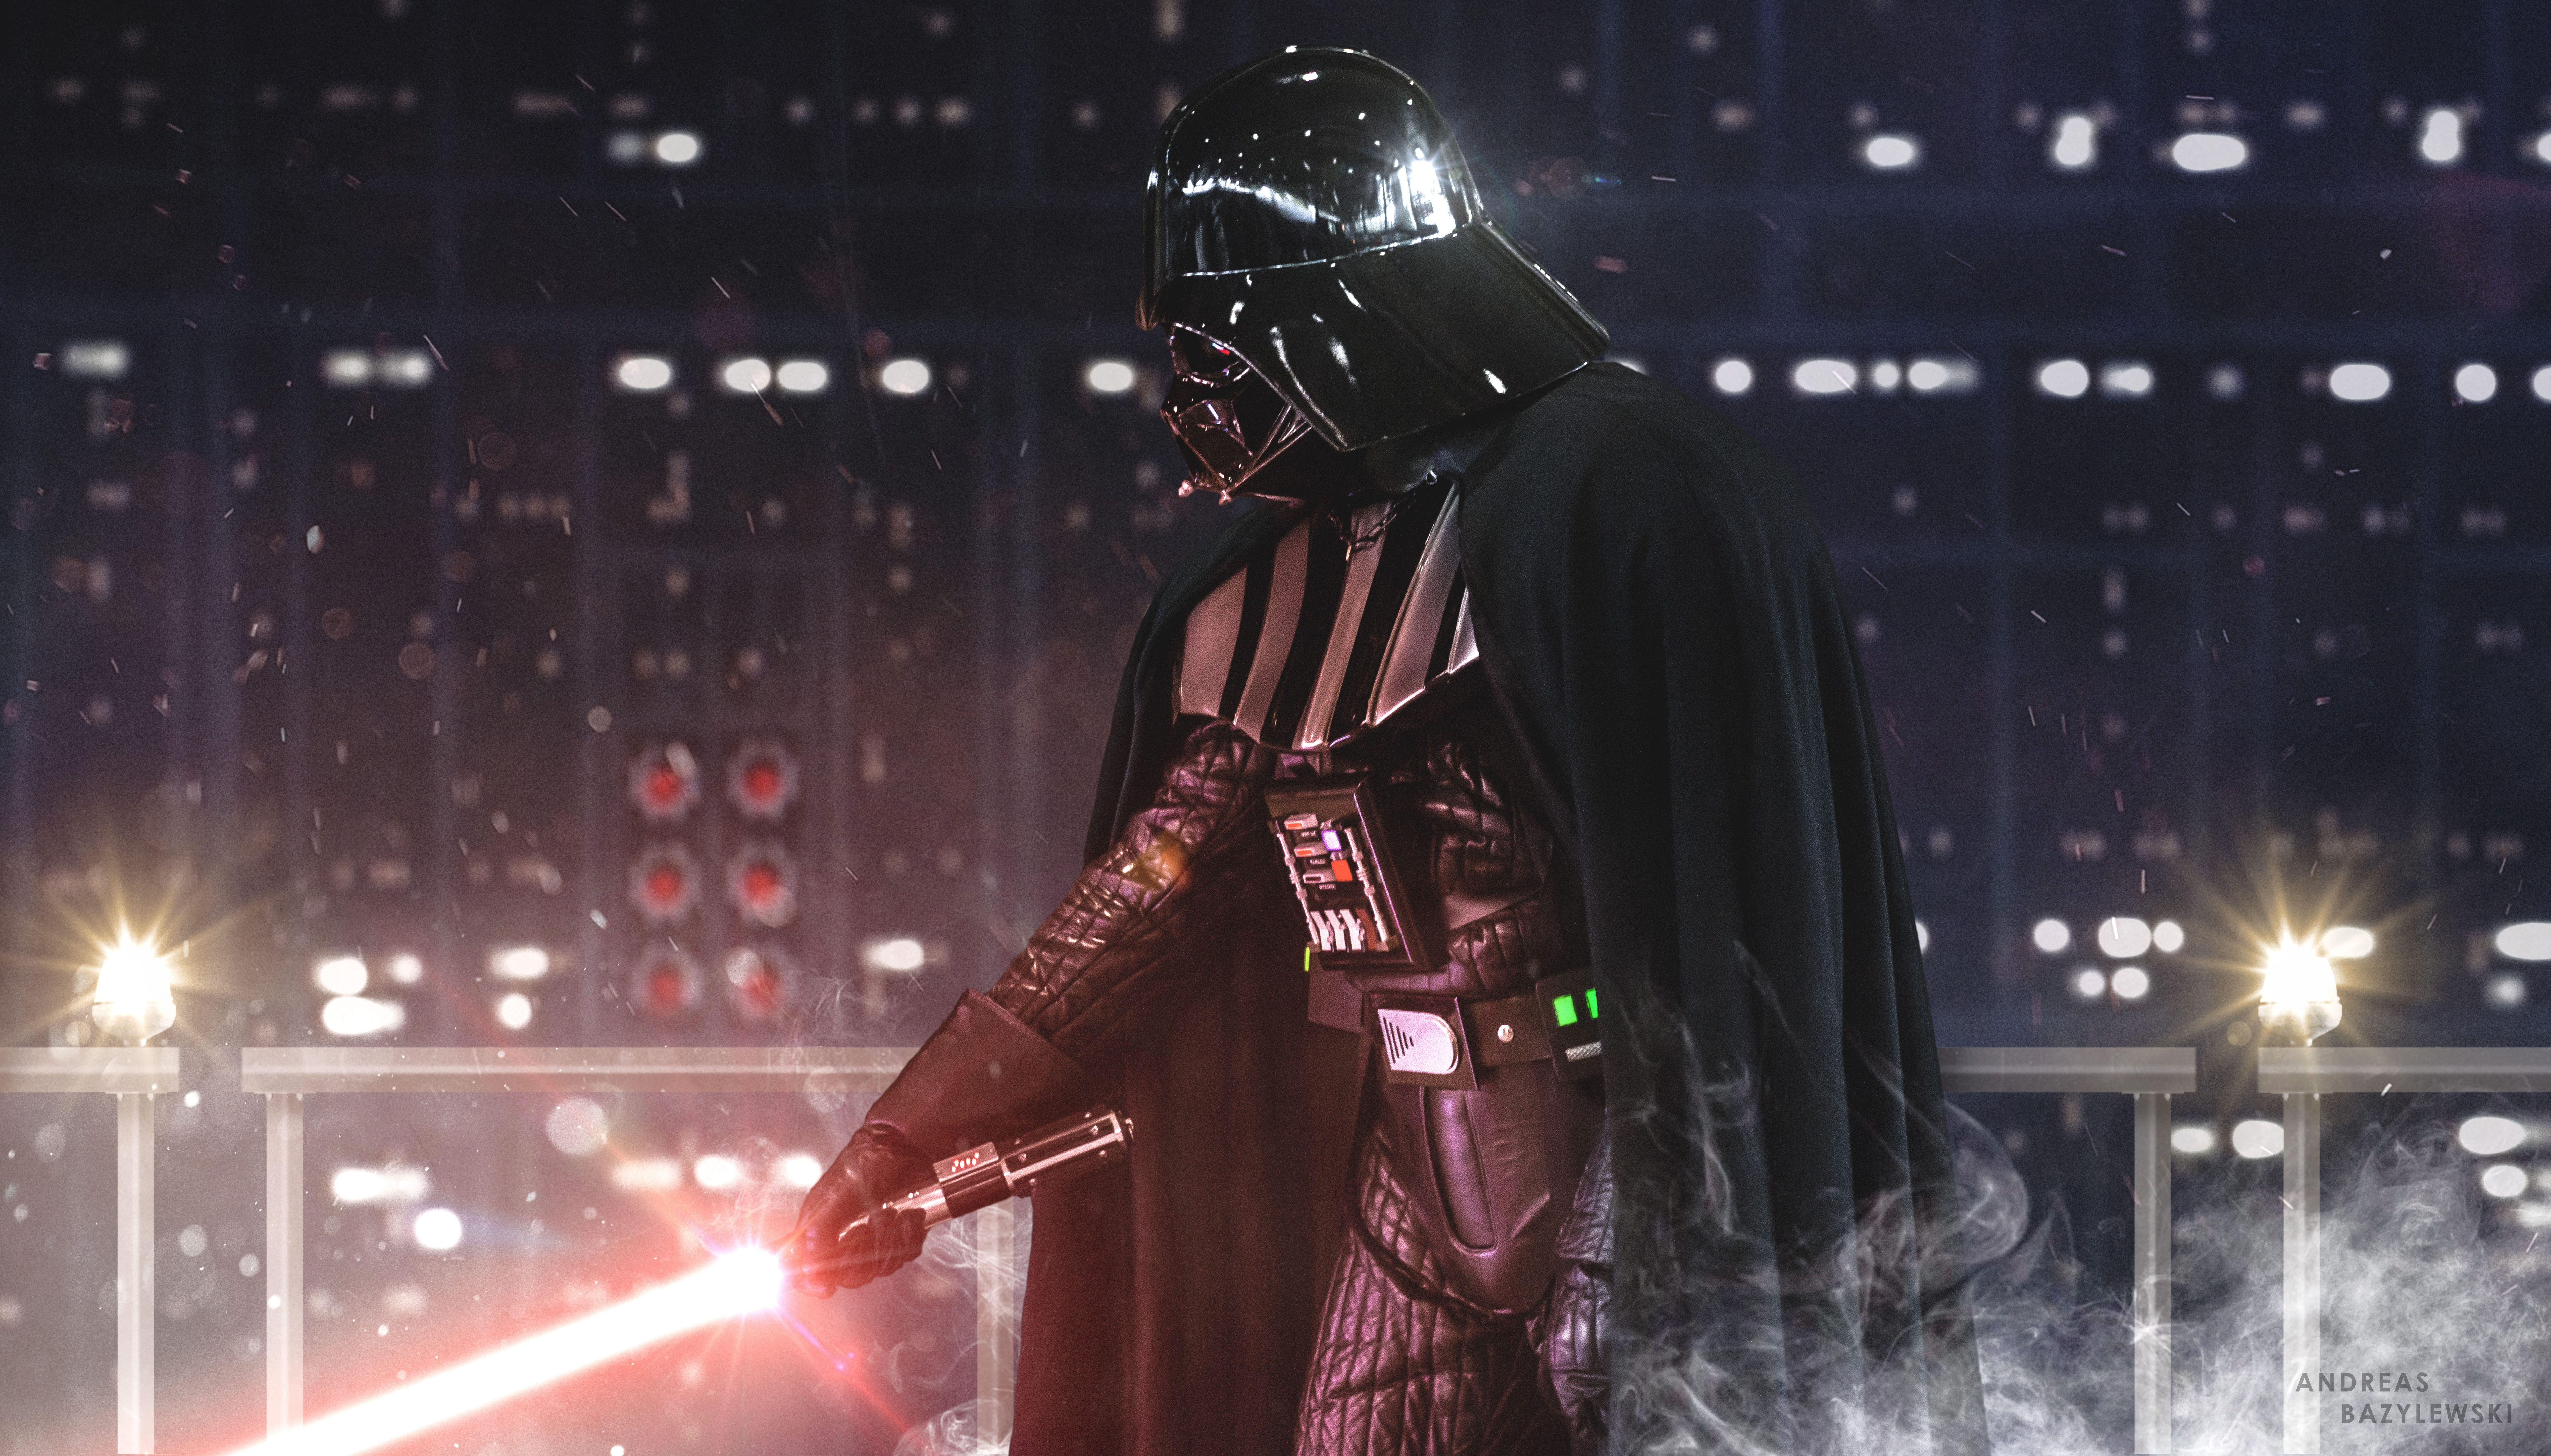 Darth Vader Wallpapers   Top Darth Vader Backgrounds 10617x6061